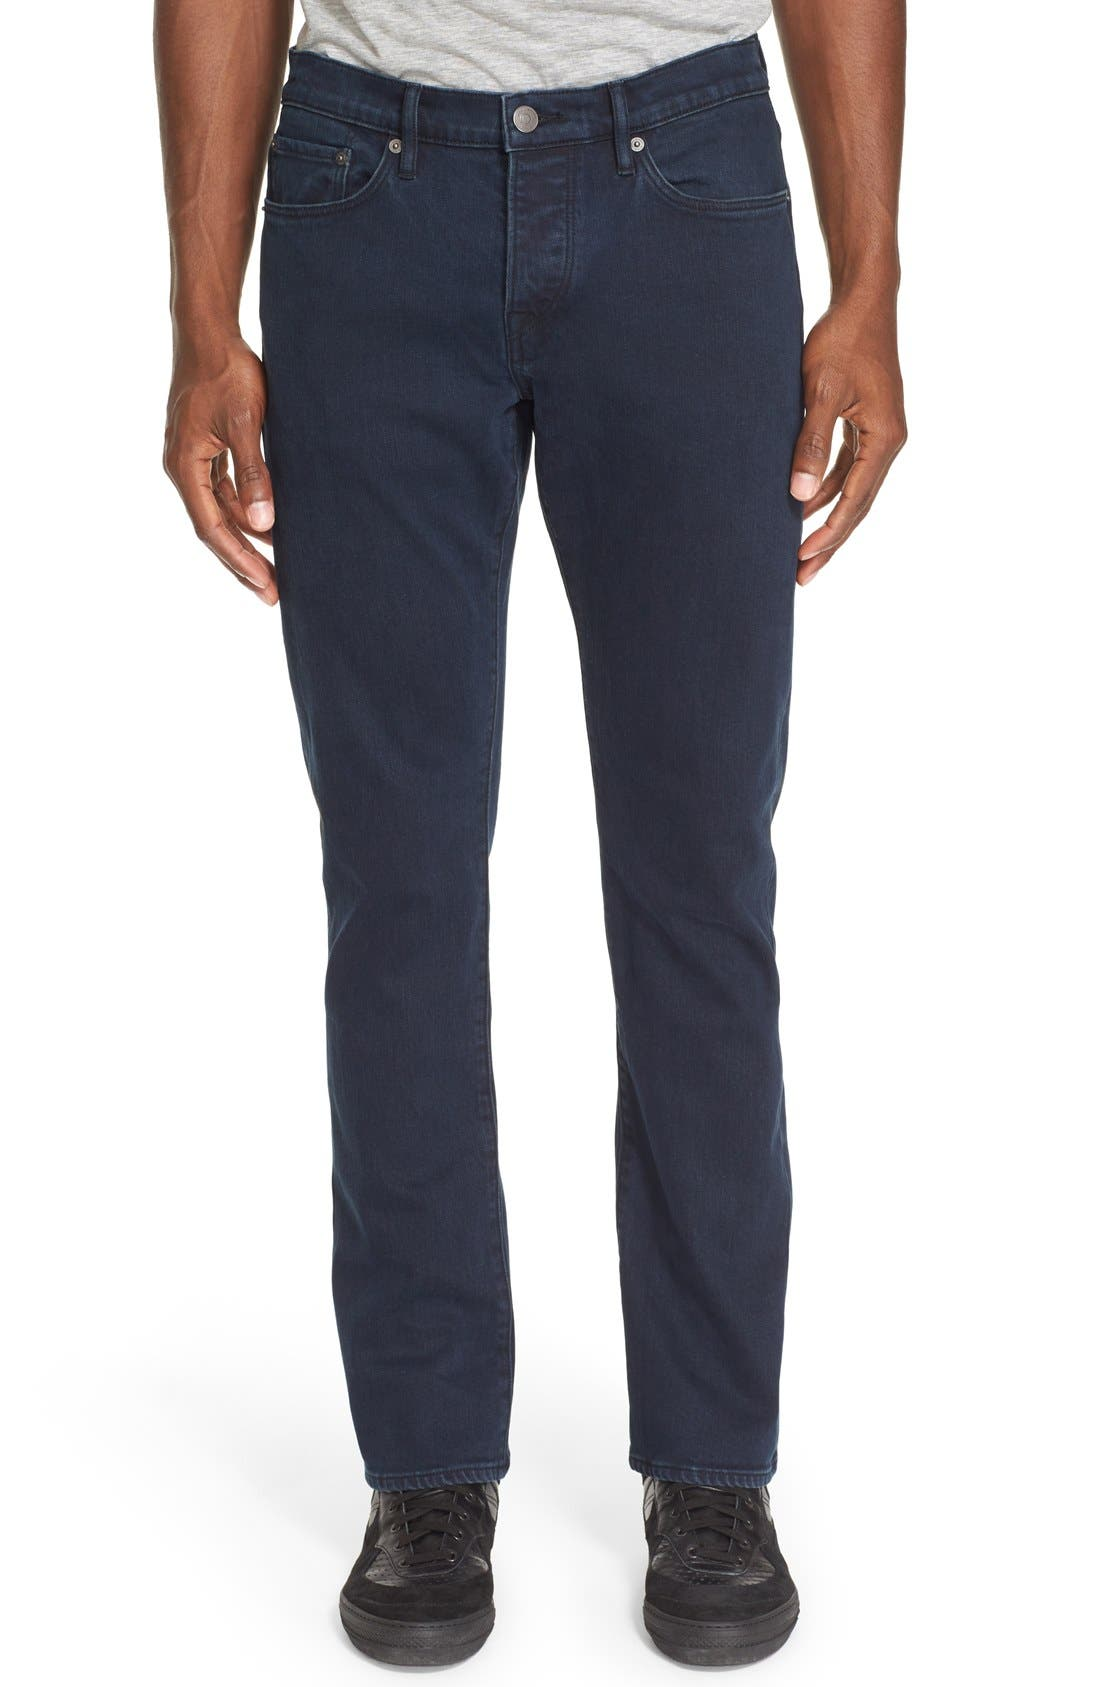 Straight Leg Jeans Jeans,                             Main thumbnail 1, color,                             Dark Indigo